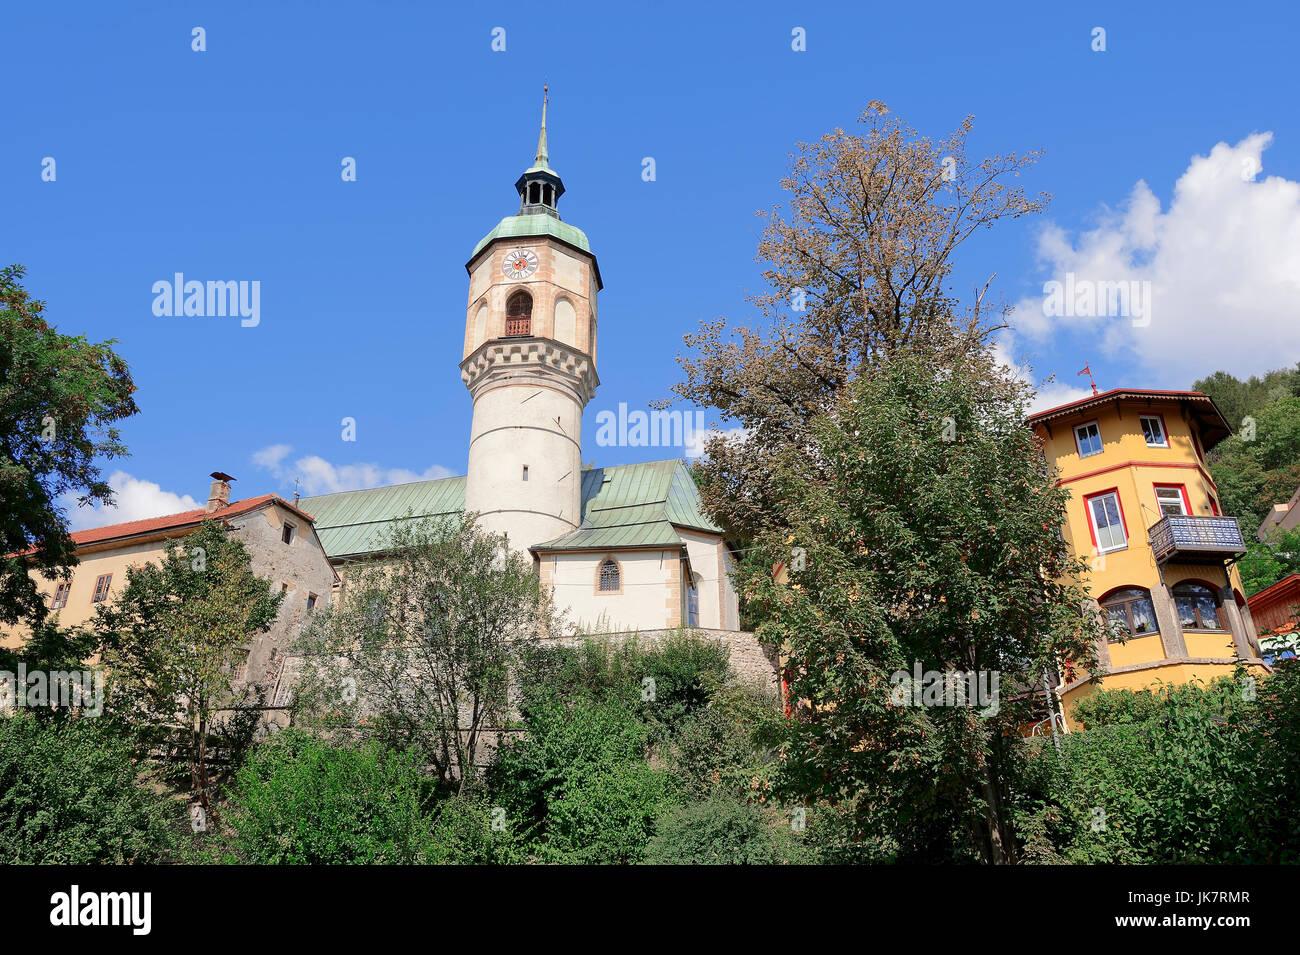 Living tower of the sirs of Hotting, Hotting, Innsbruck, Tyrol, Austria   Wohnturm der Herren von Hoetting, Hötting, - Stock Image